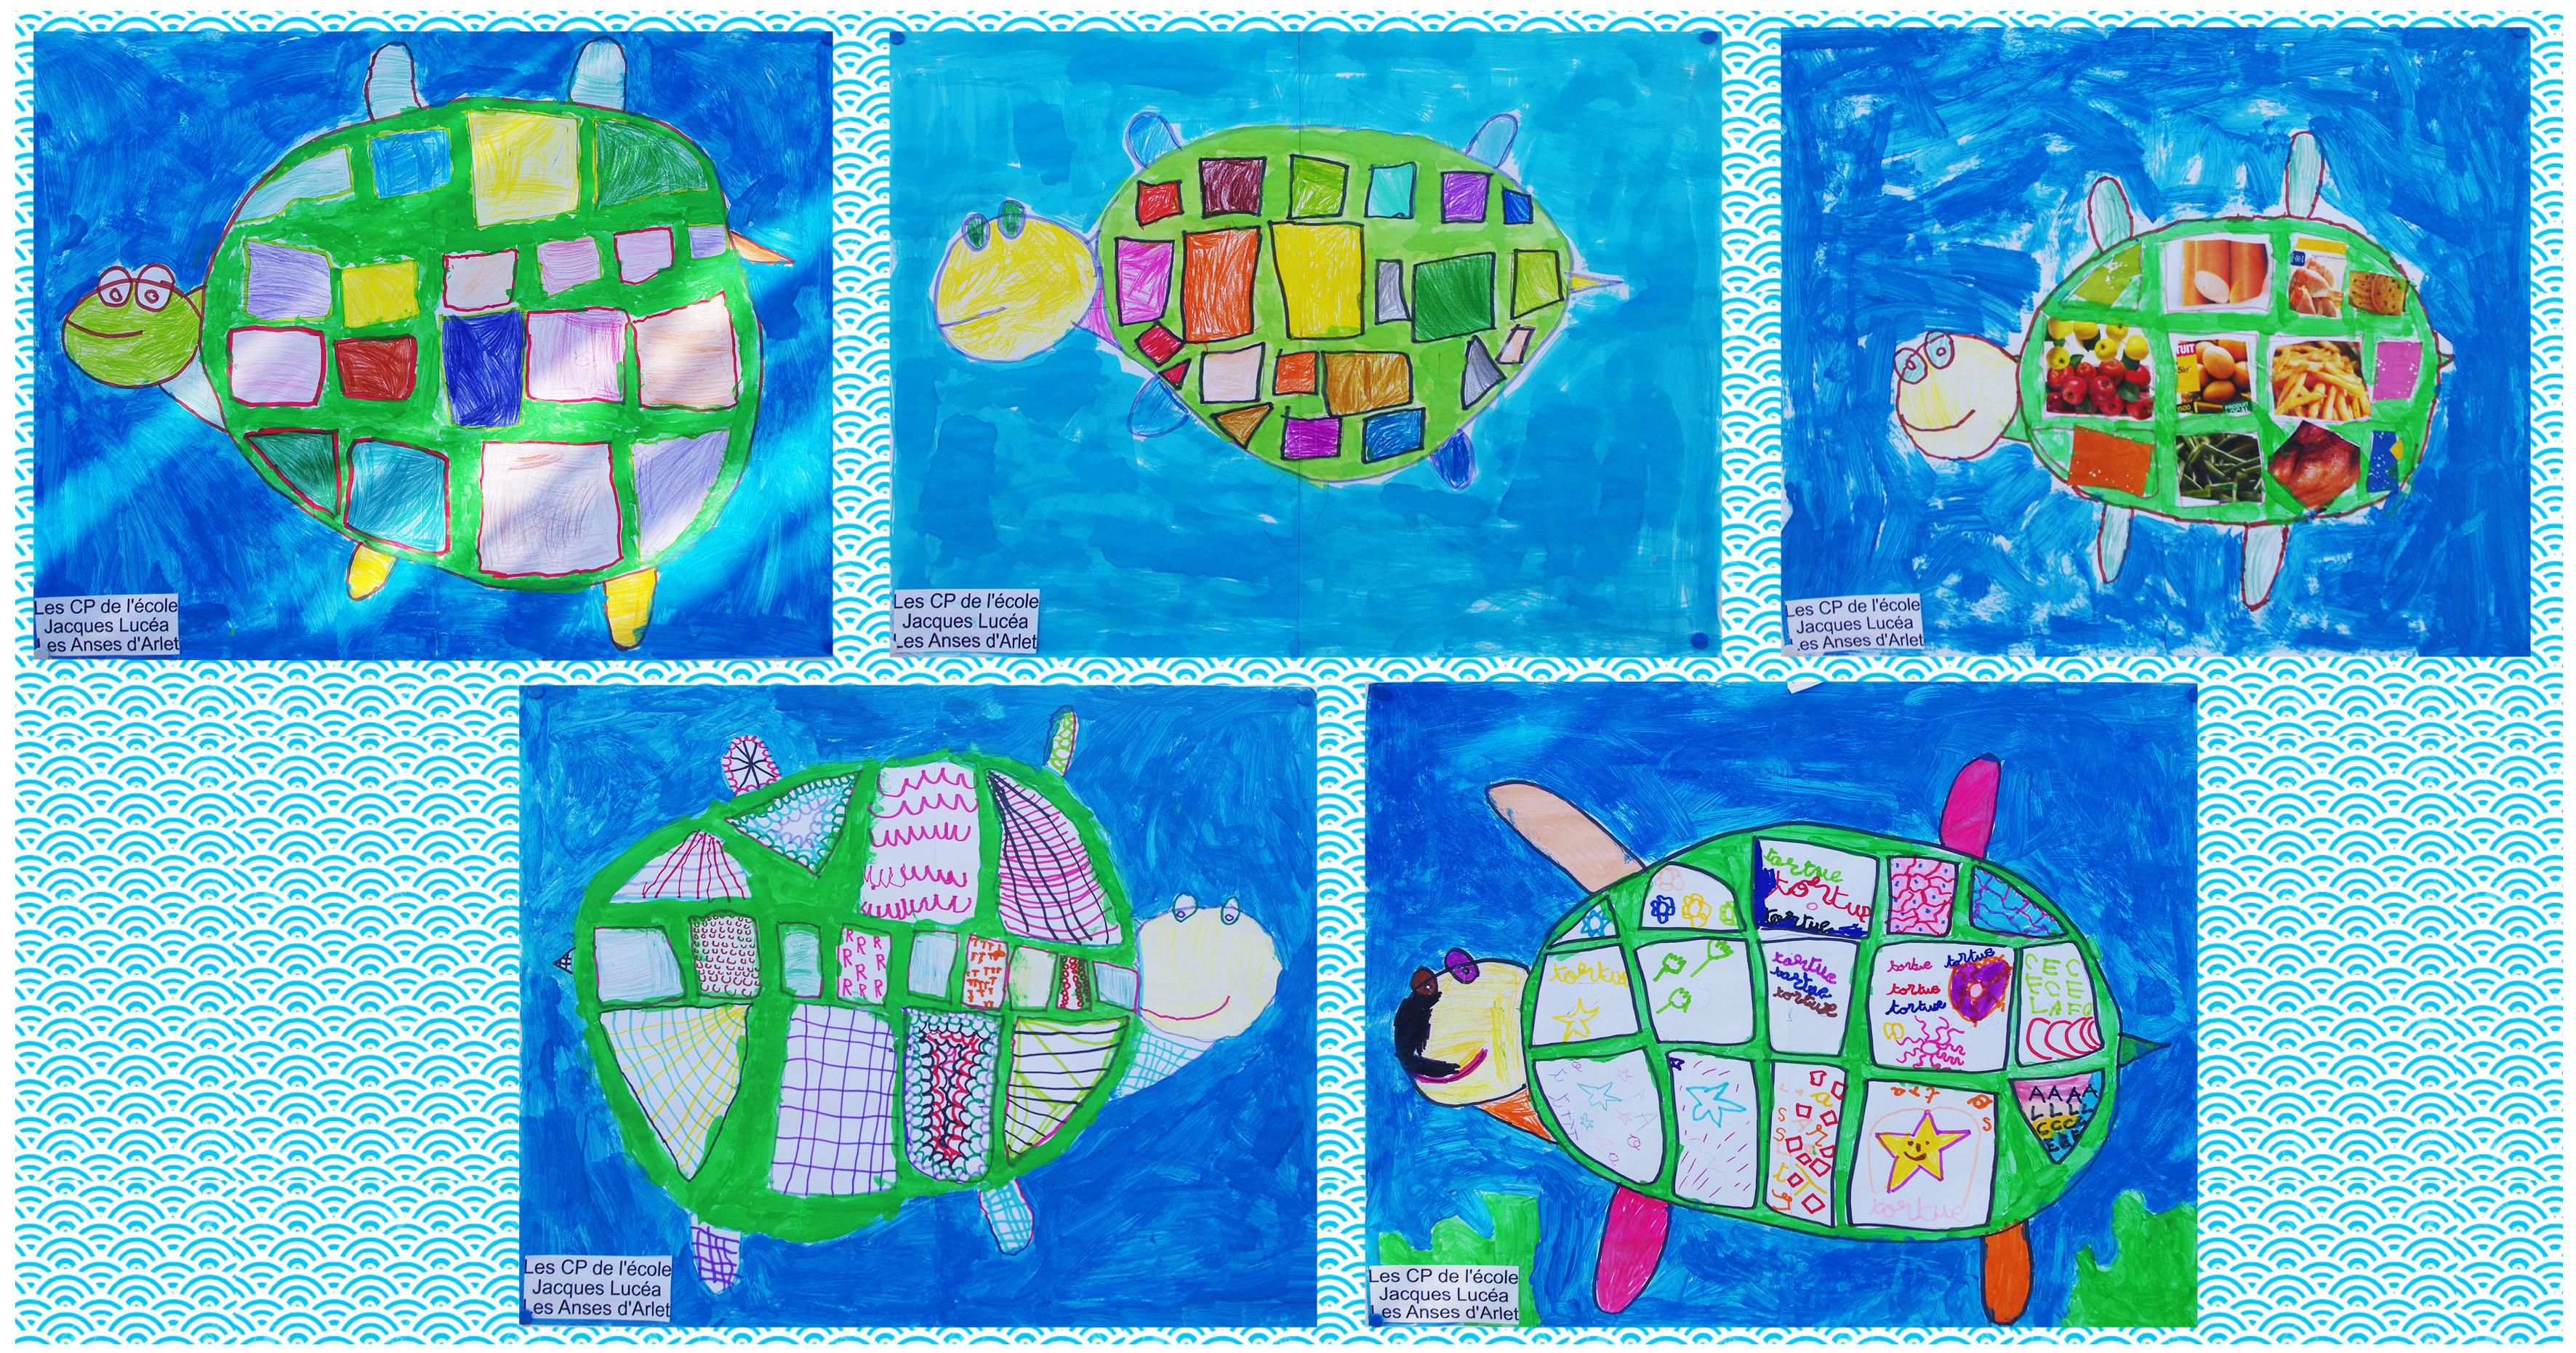 Dessins tortues des CP